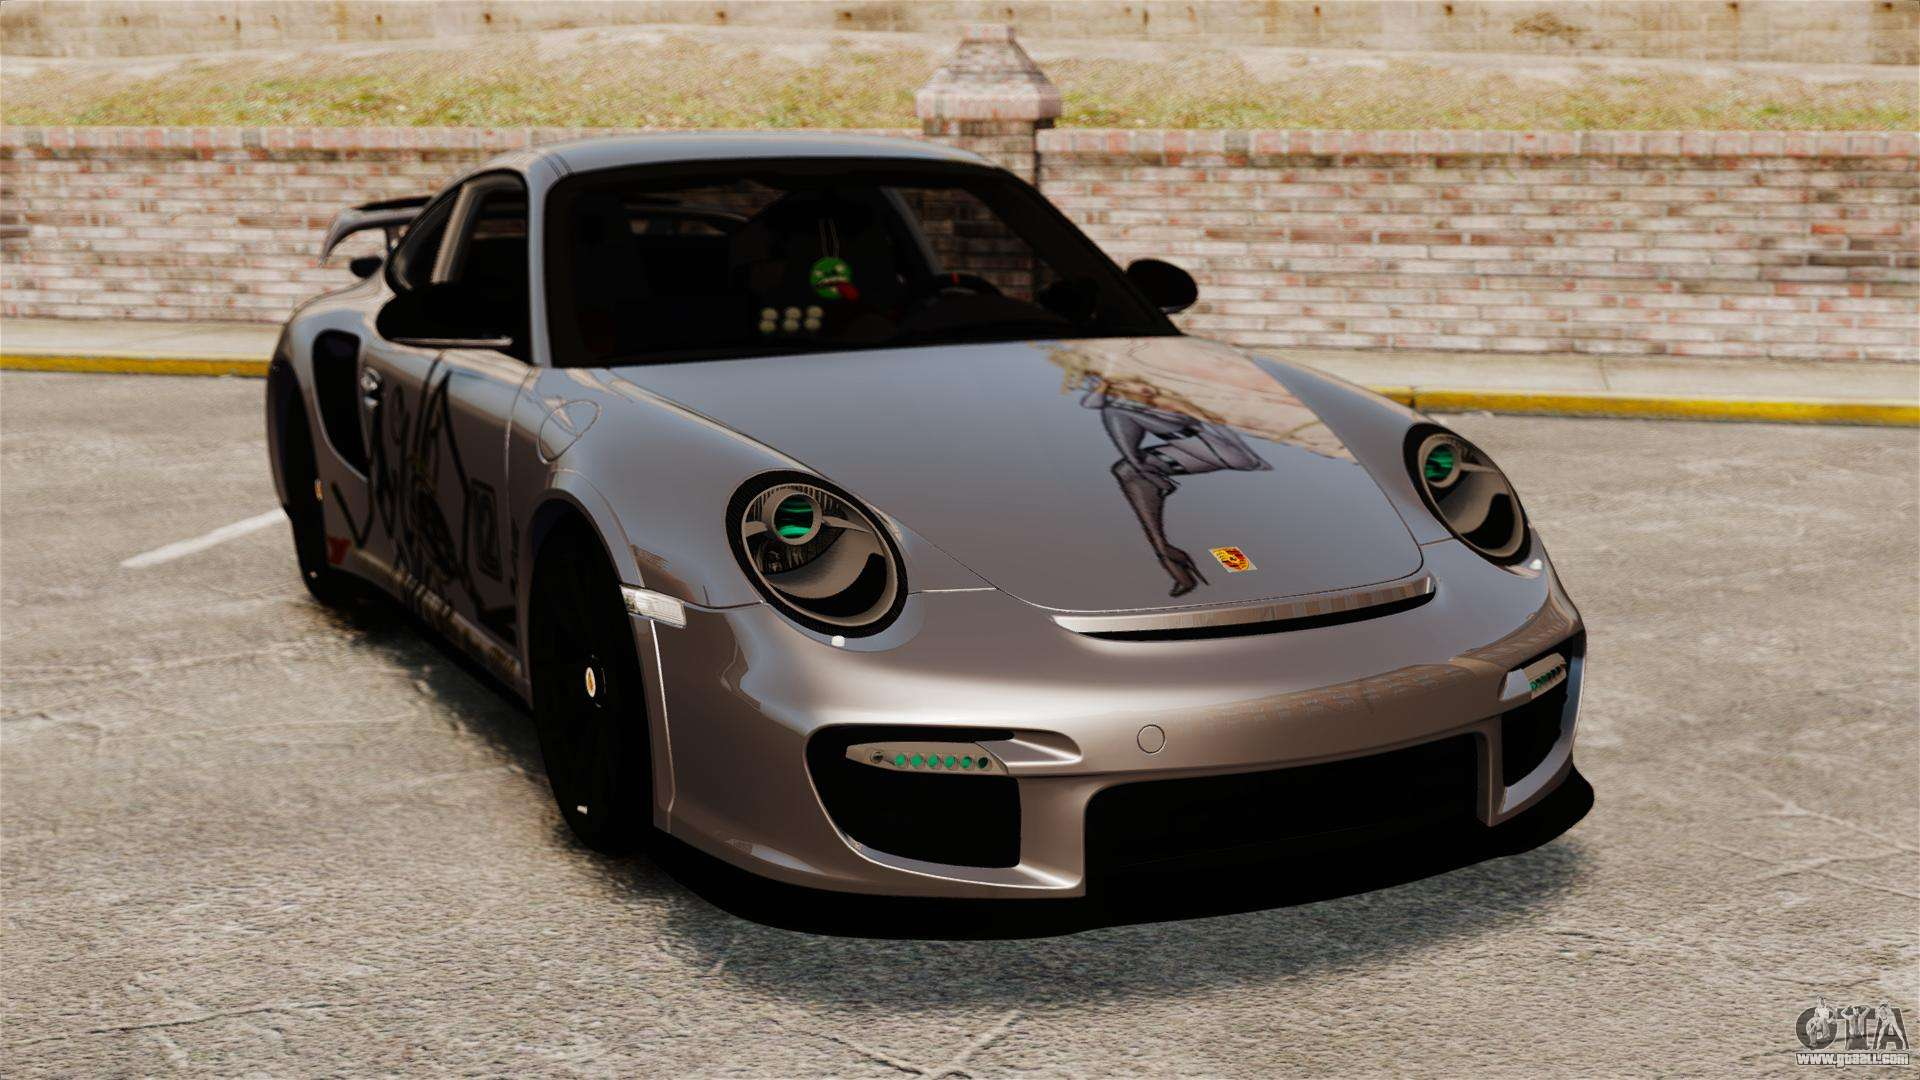 145237-GTAIV-2013-12-29-02-03-39-79 Remarkable Porsche 911 Gt2 Xbox 360 Cars Trend